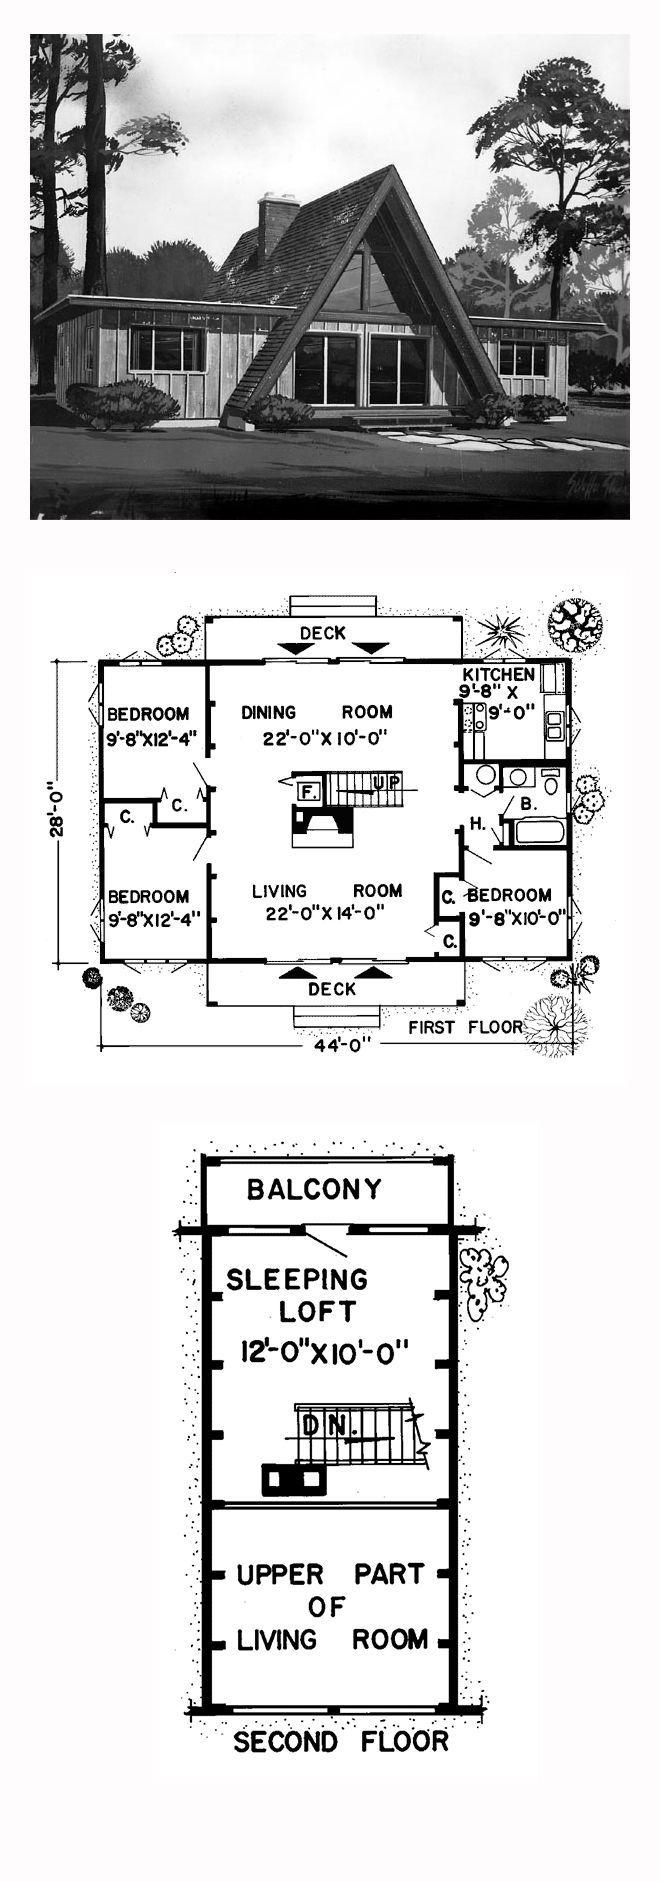 10 Best Modern Ranch House Floor Plans Design And Ideas Barndominium Ranchhouse Tags Ranch House Ran A Frame House Plans House Layout Plans A Frame House